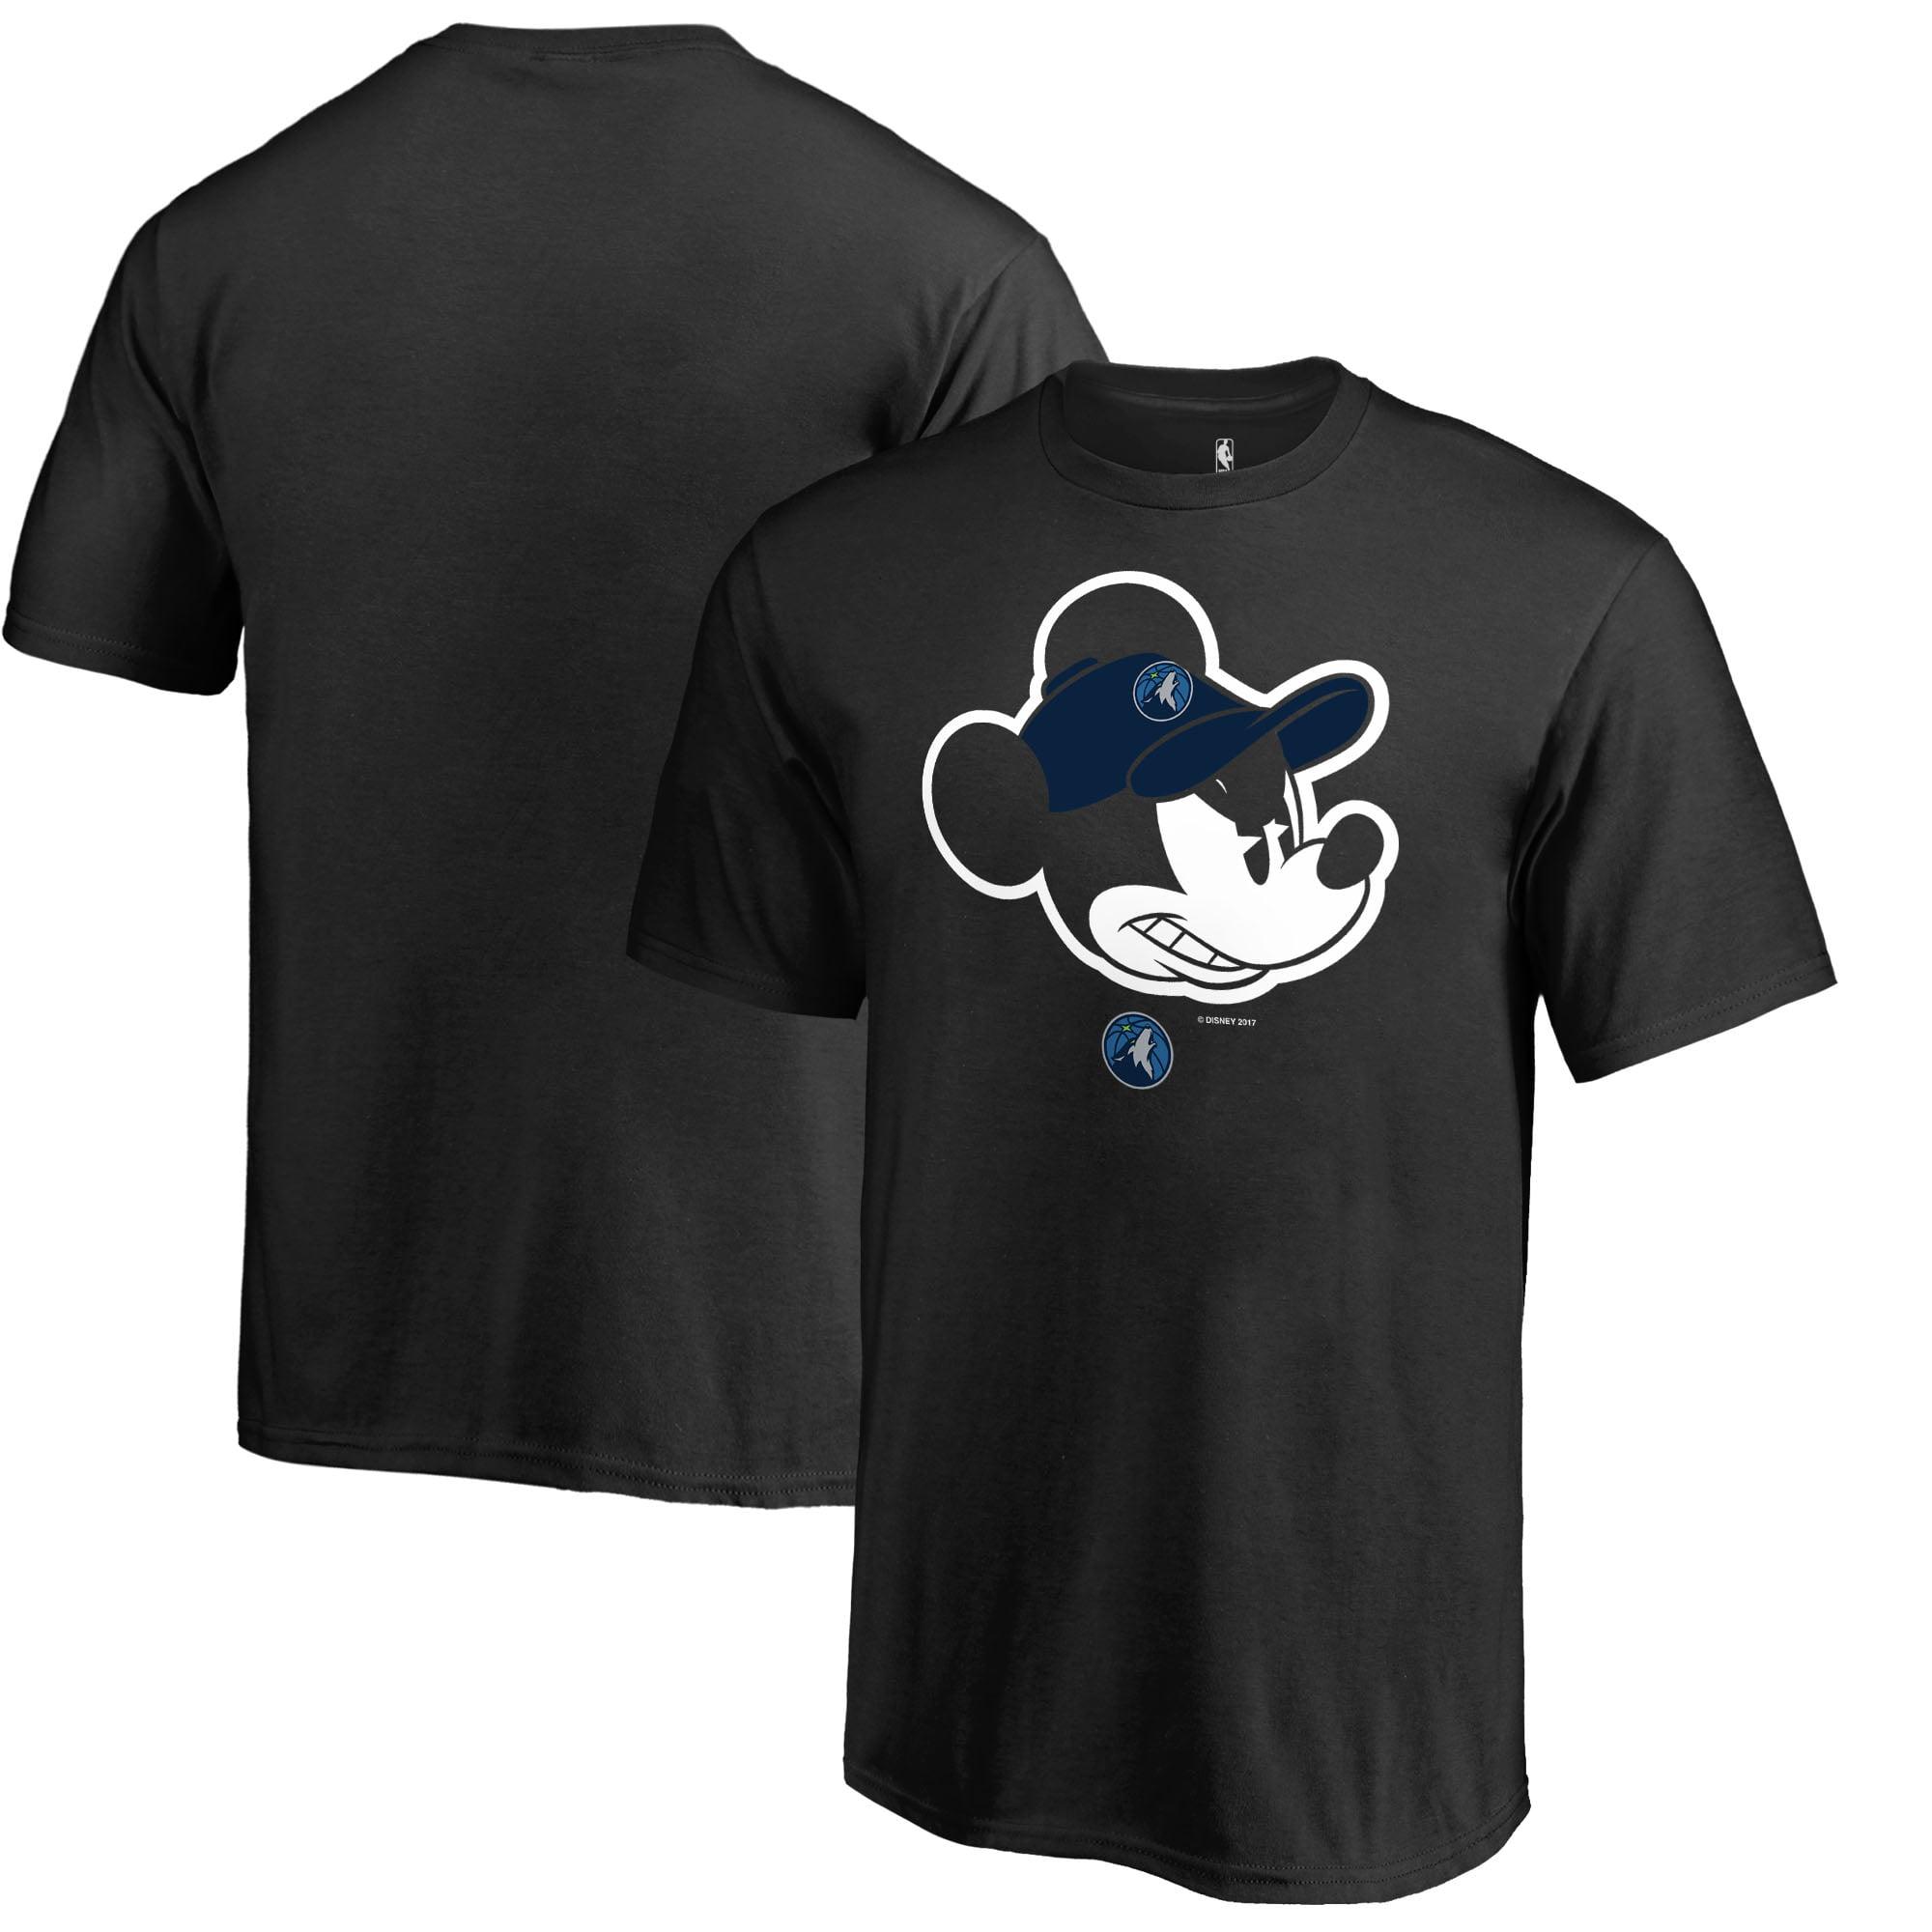 Minnesota Timberwolves Fanatics Branded Youth Disney Game Face T-Shirt - Black